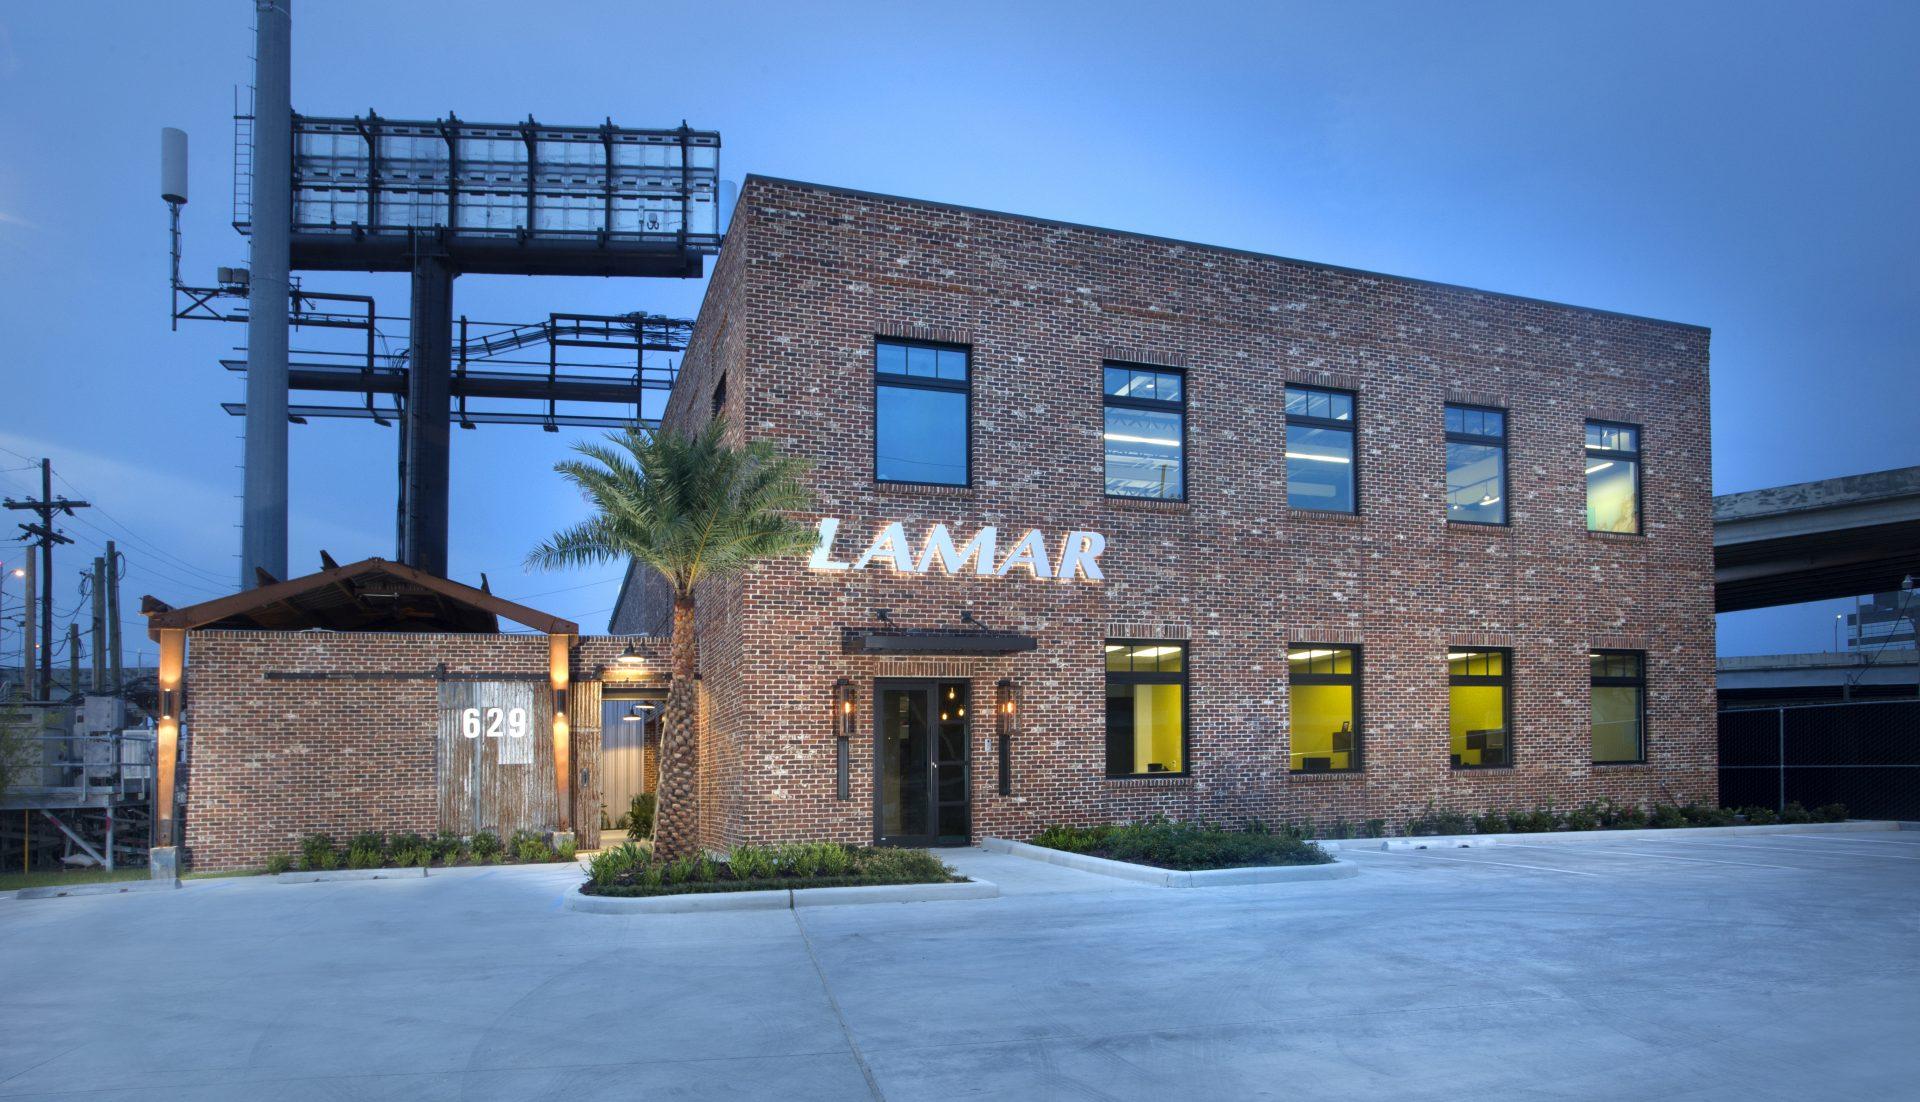 Lamar Advertising - New Orleans exterior at dusk with illuminated Lamar signage.